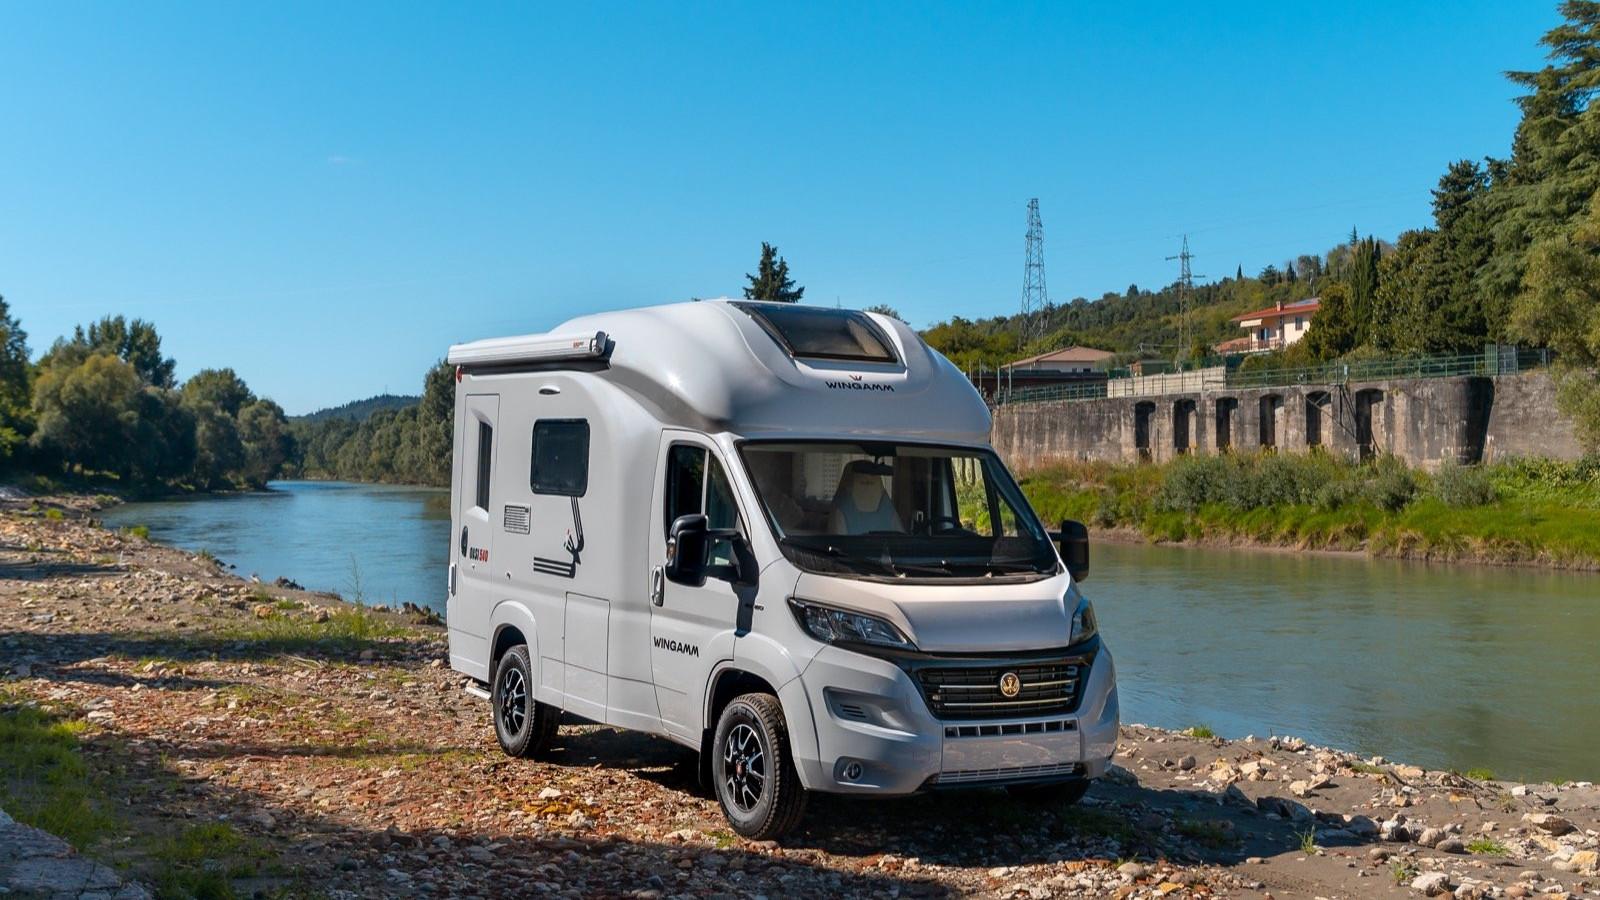 Oasi 540 - petite conduite de camping-car premium - camping-car